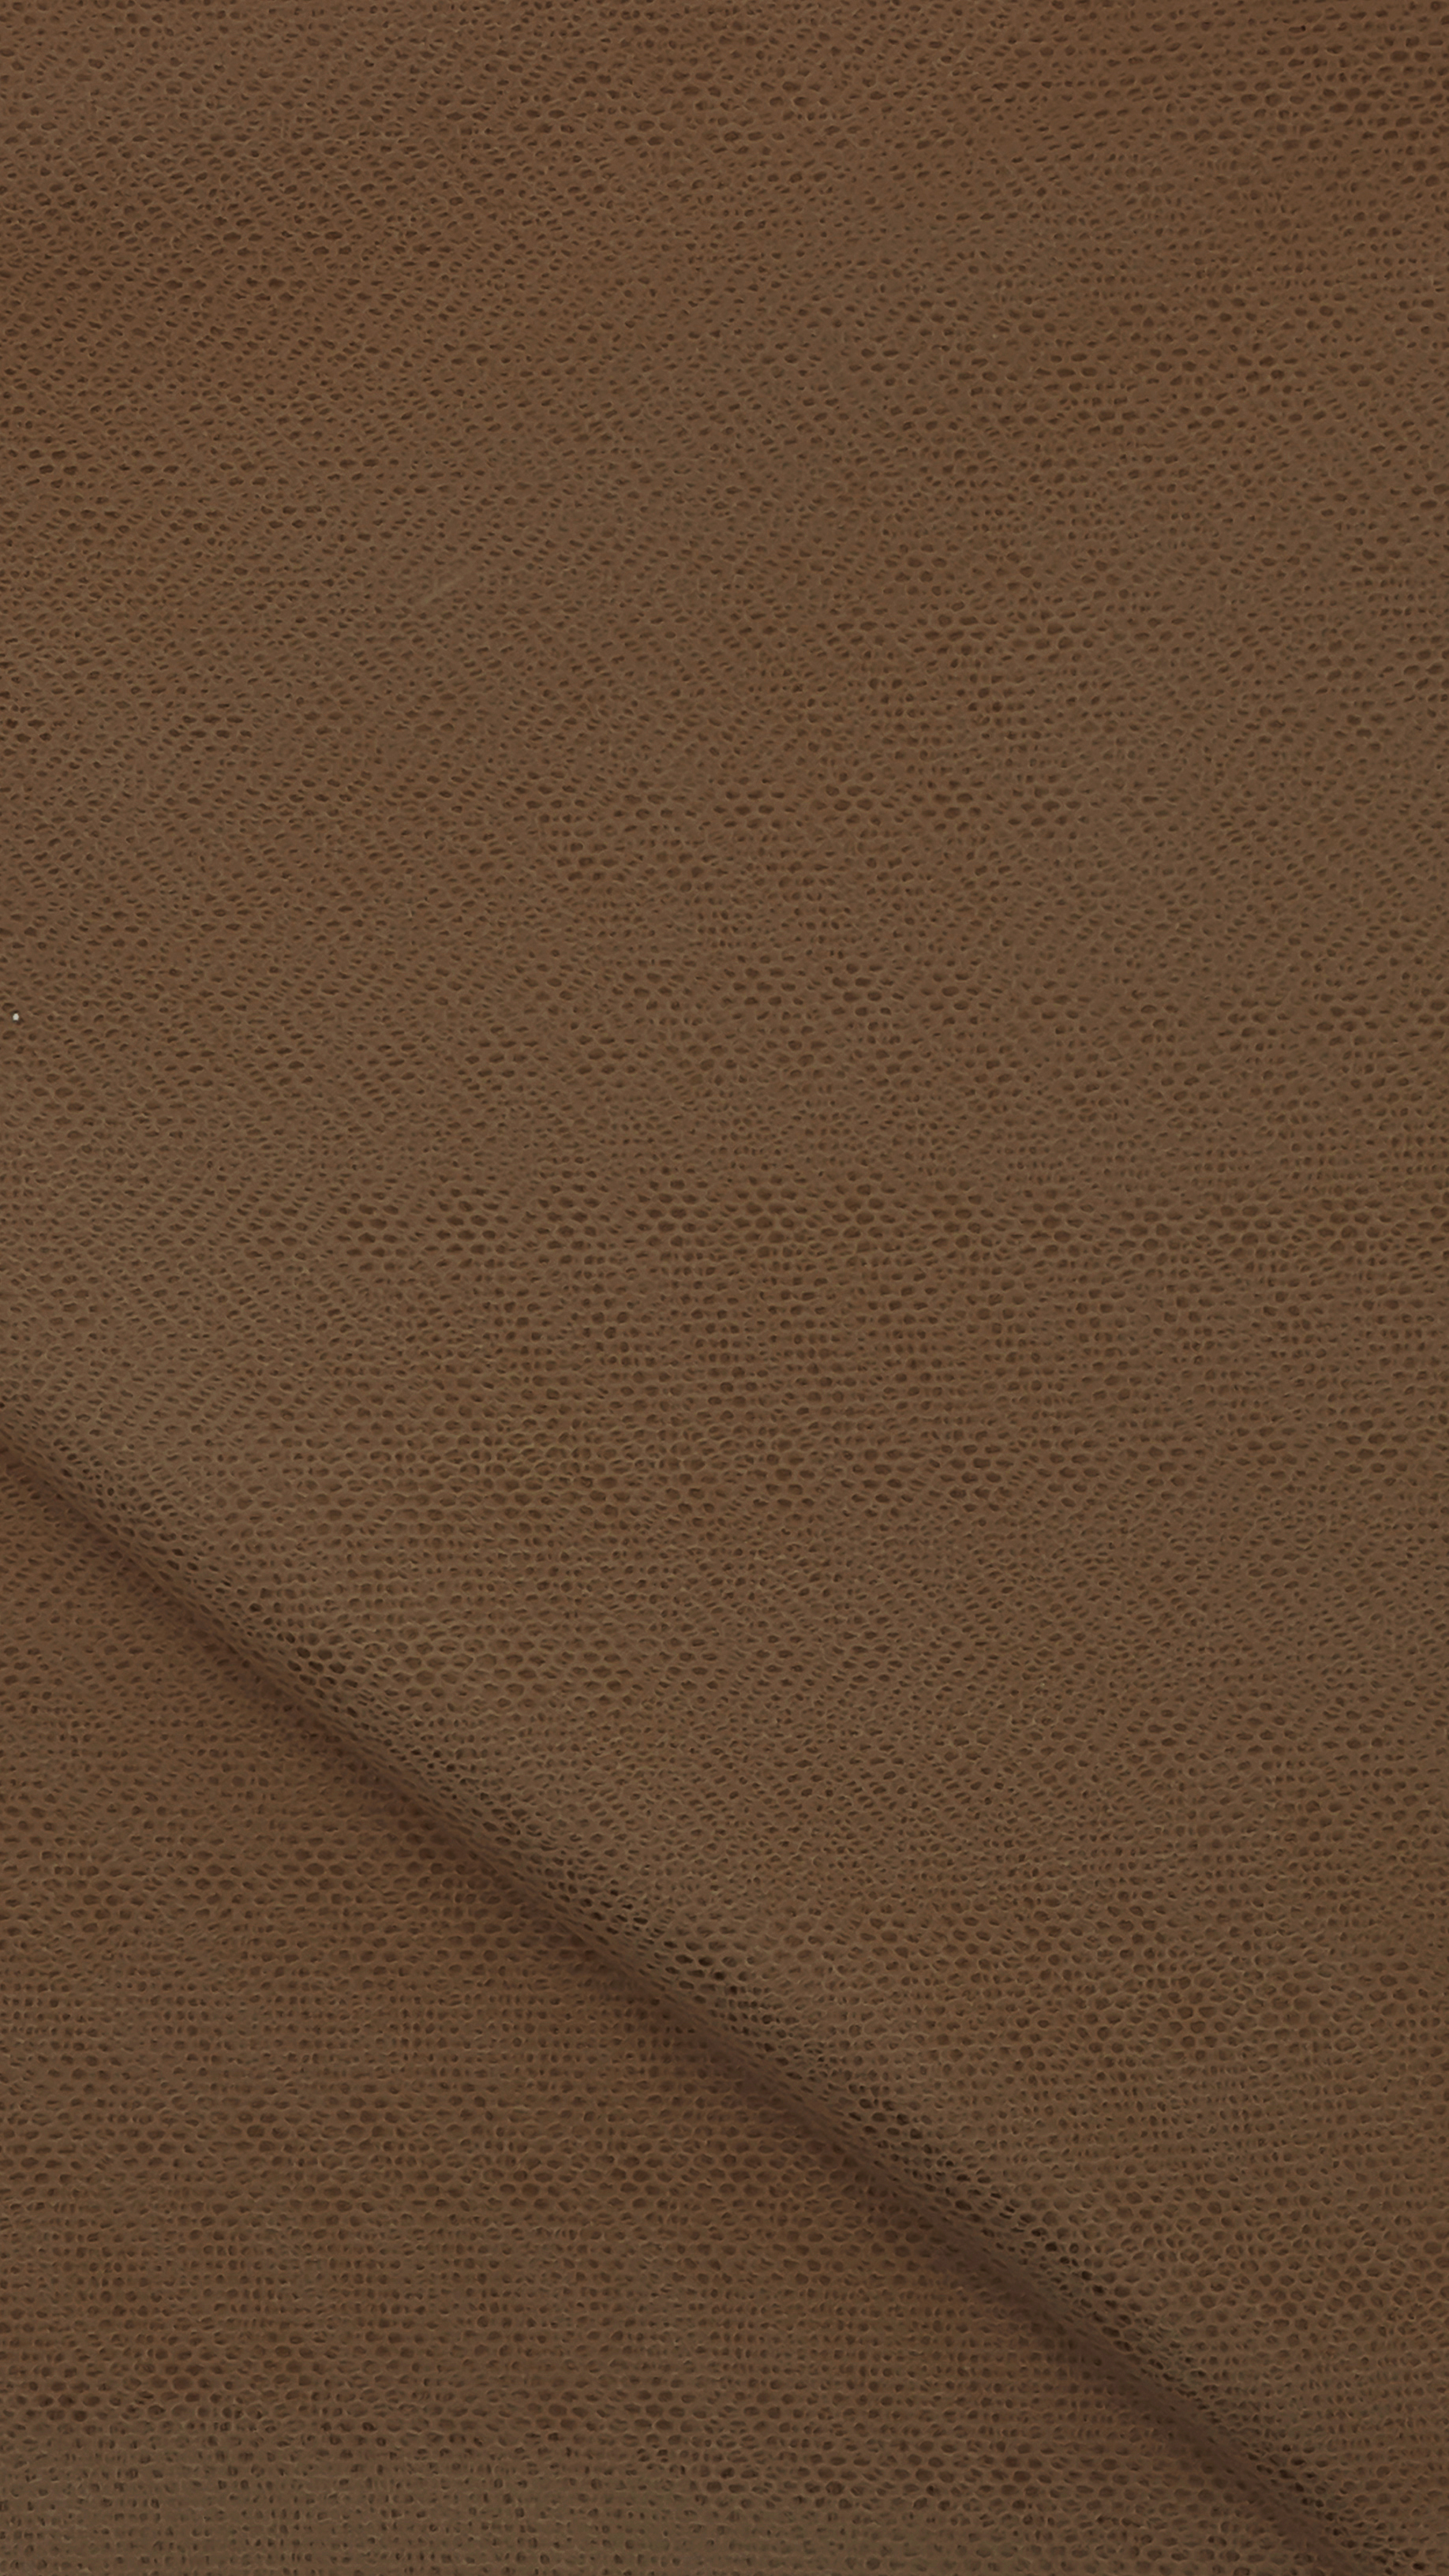 Maple Sugar | DressAnomalie